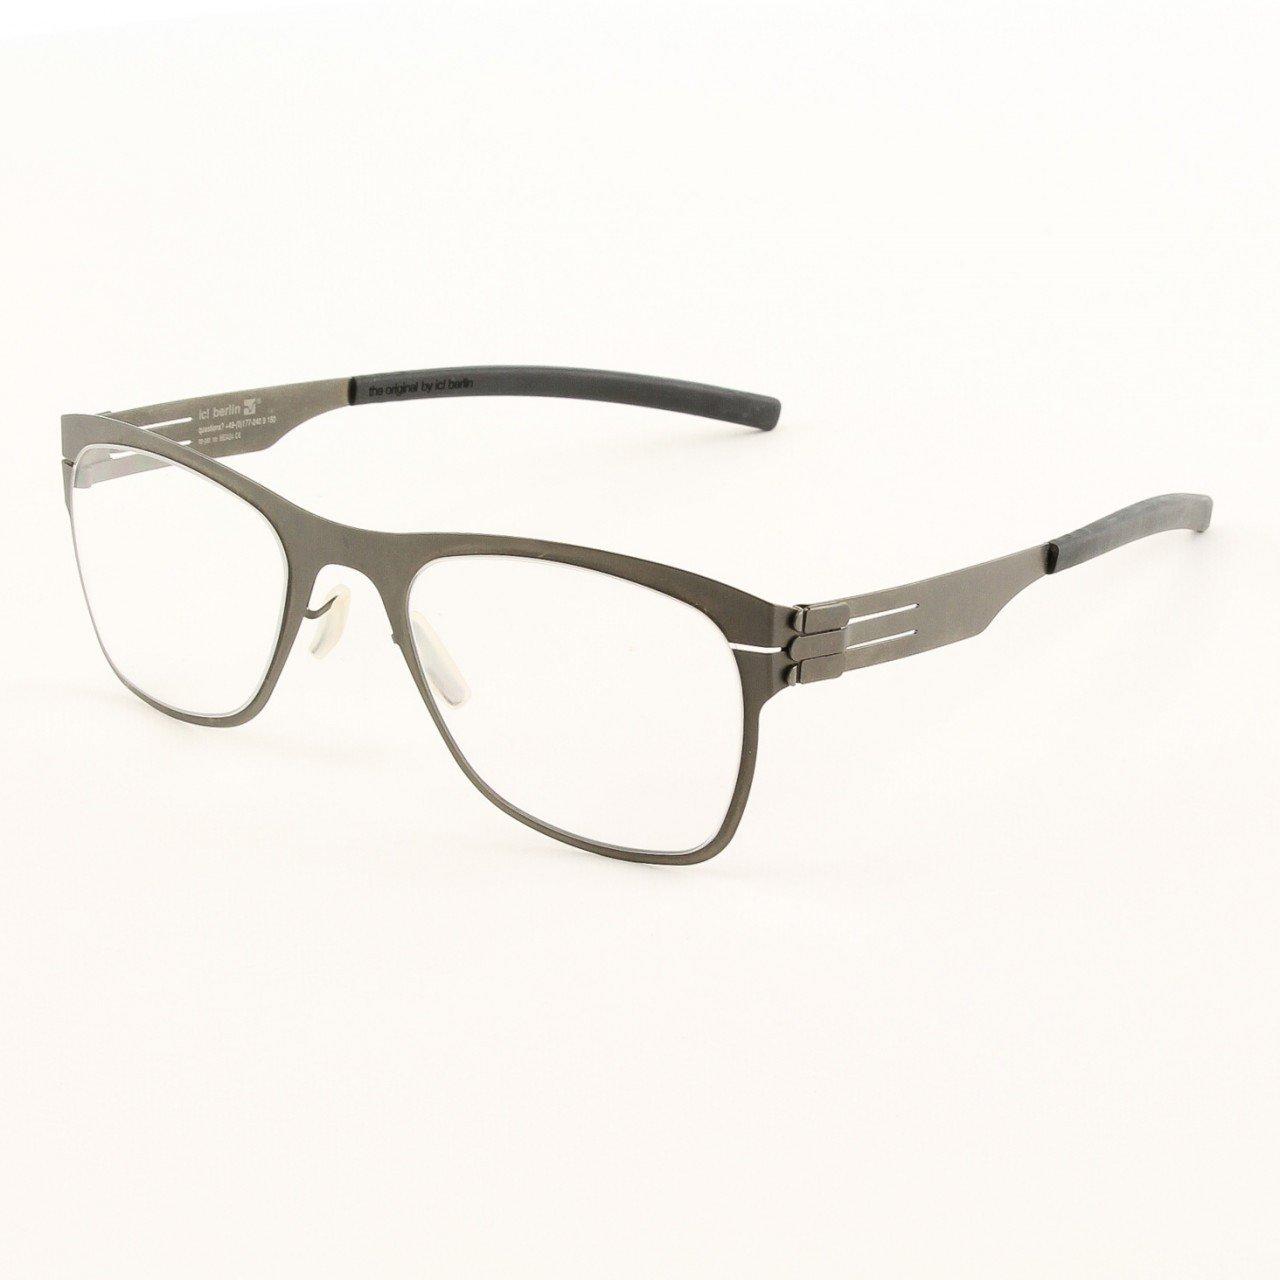 ic! Berlin Capricorno Graphite Eyeglasses Col. Graphite with Clear Lenses